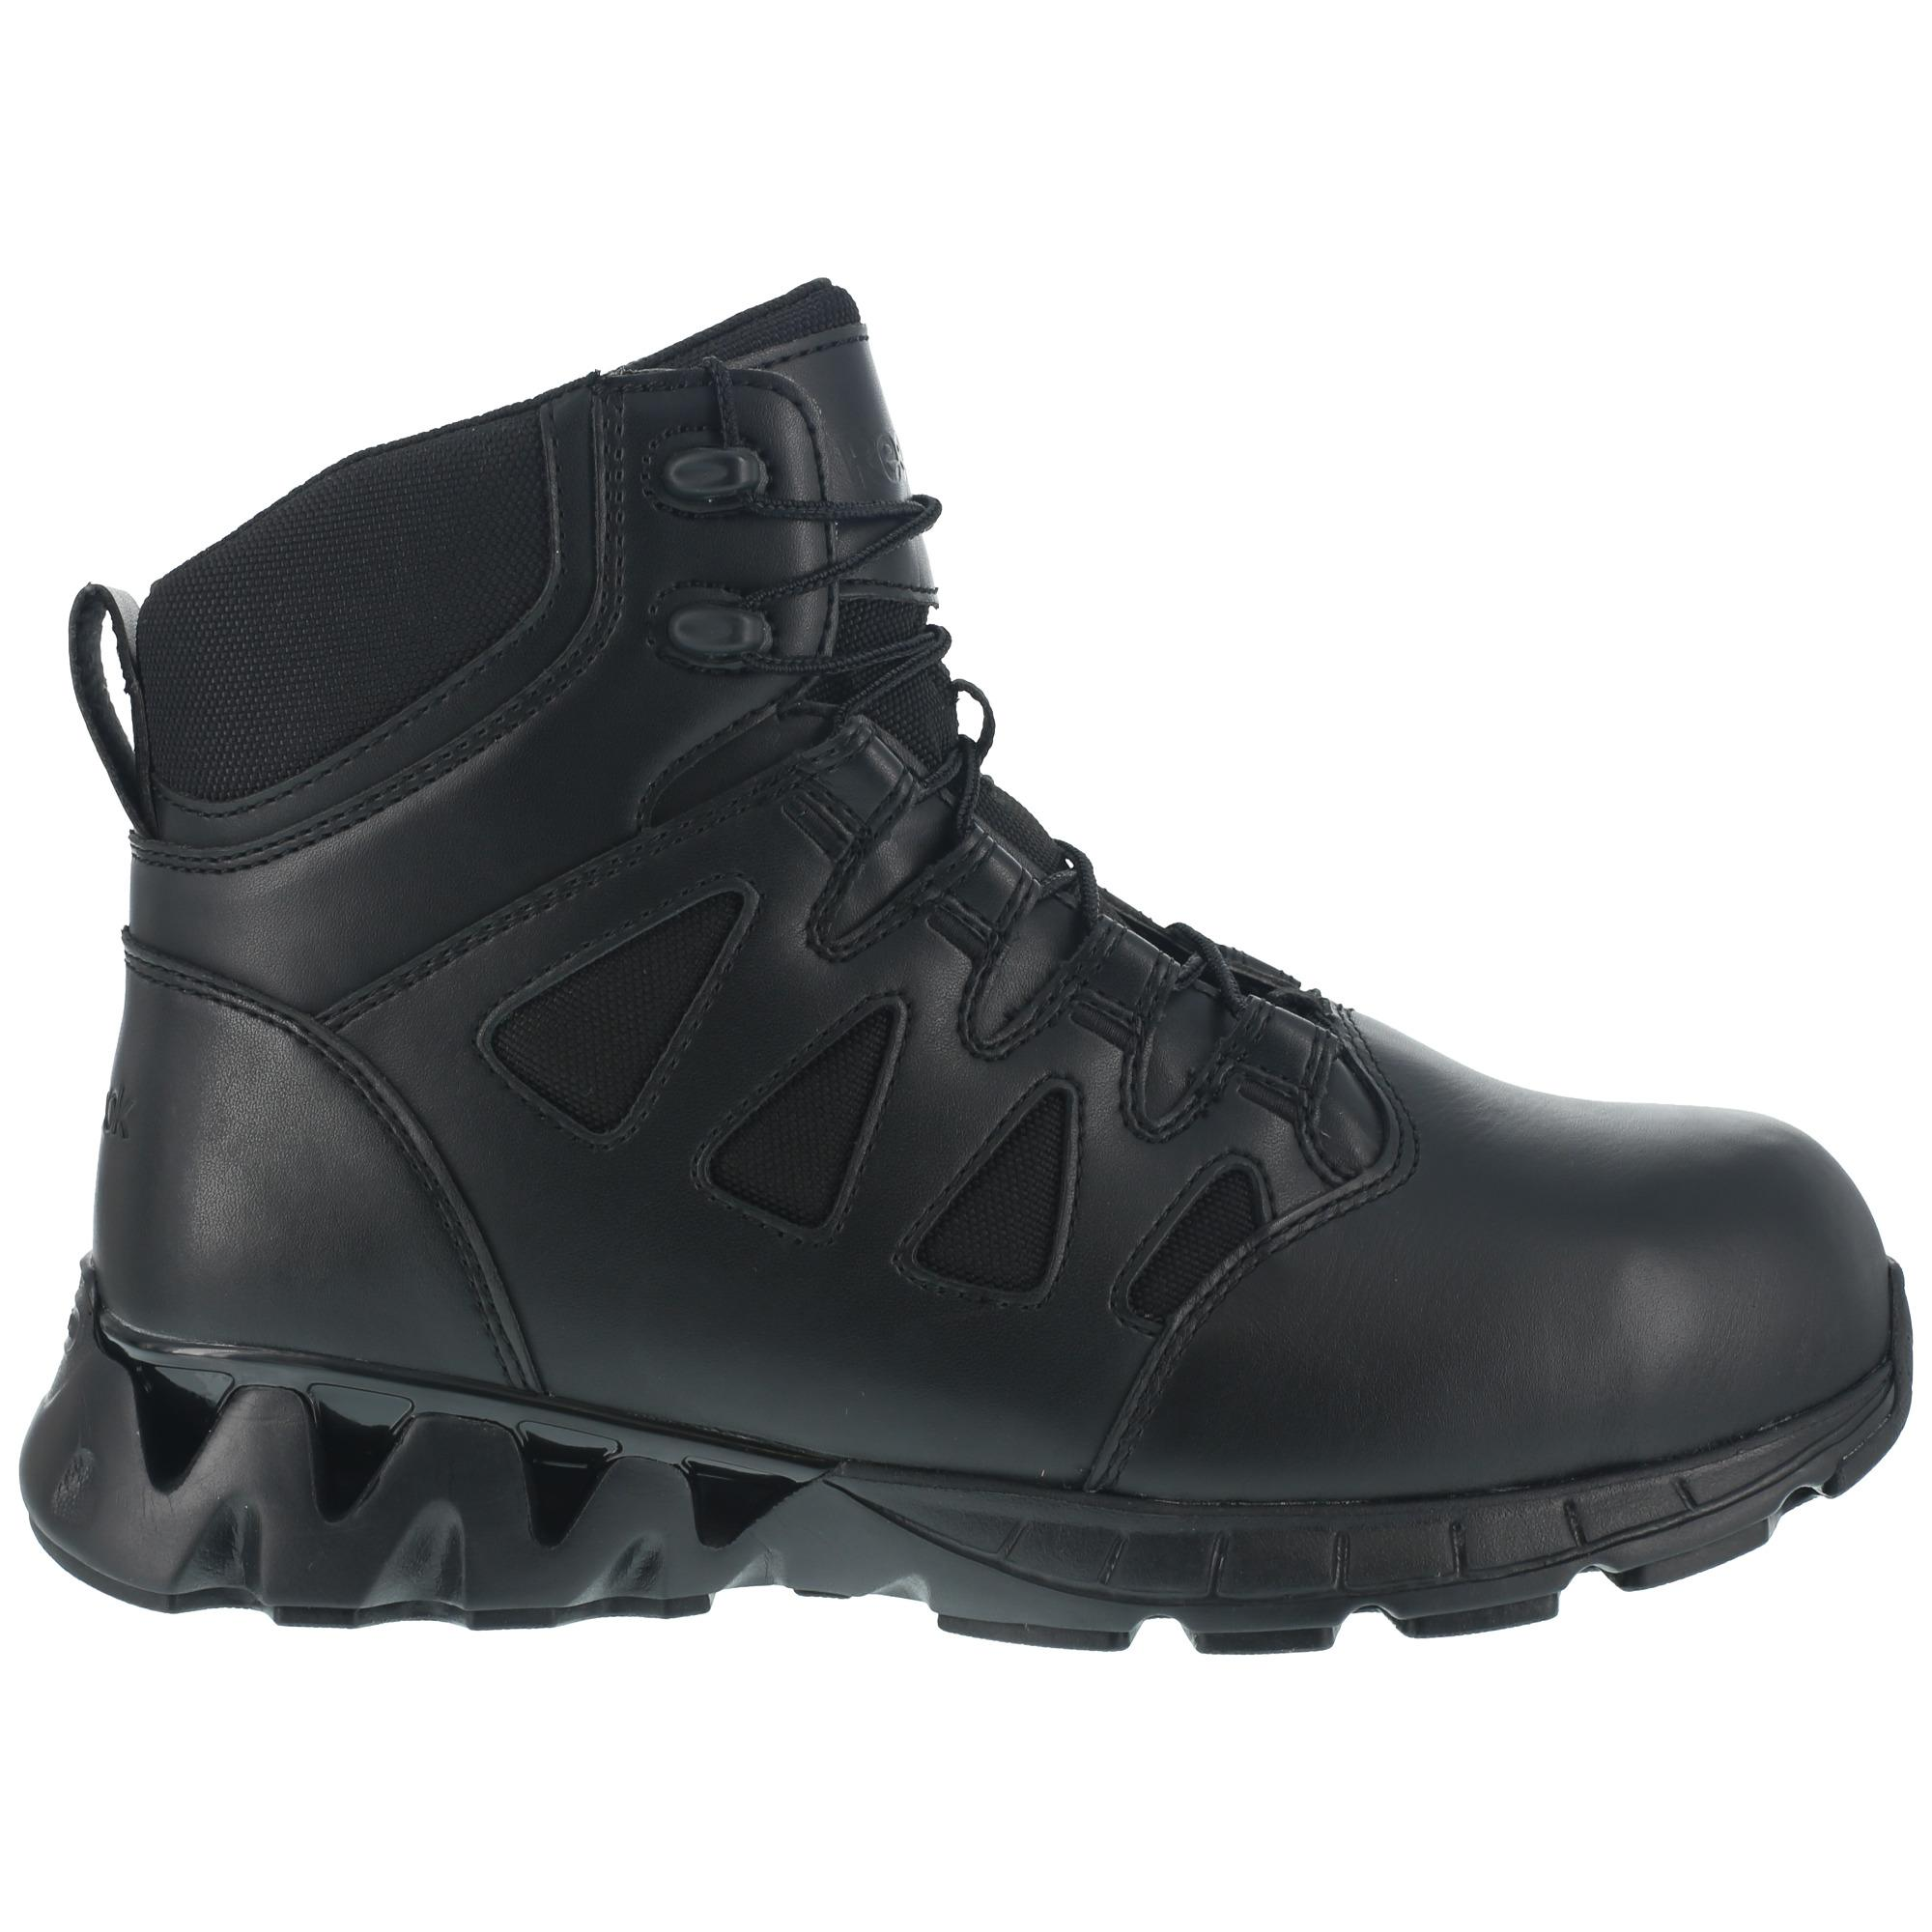 Reebok ZigKick Women s Composite Toe Tactical Work BootReebok ZigKick  Women s Composite Toe Tactical Work Boot 111a49d47